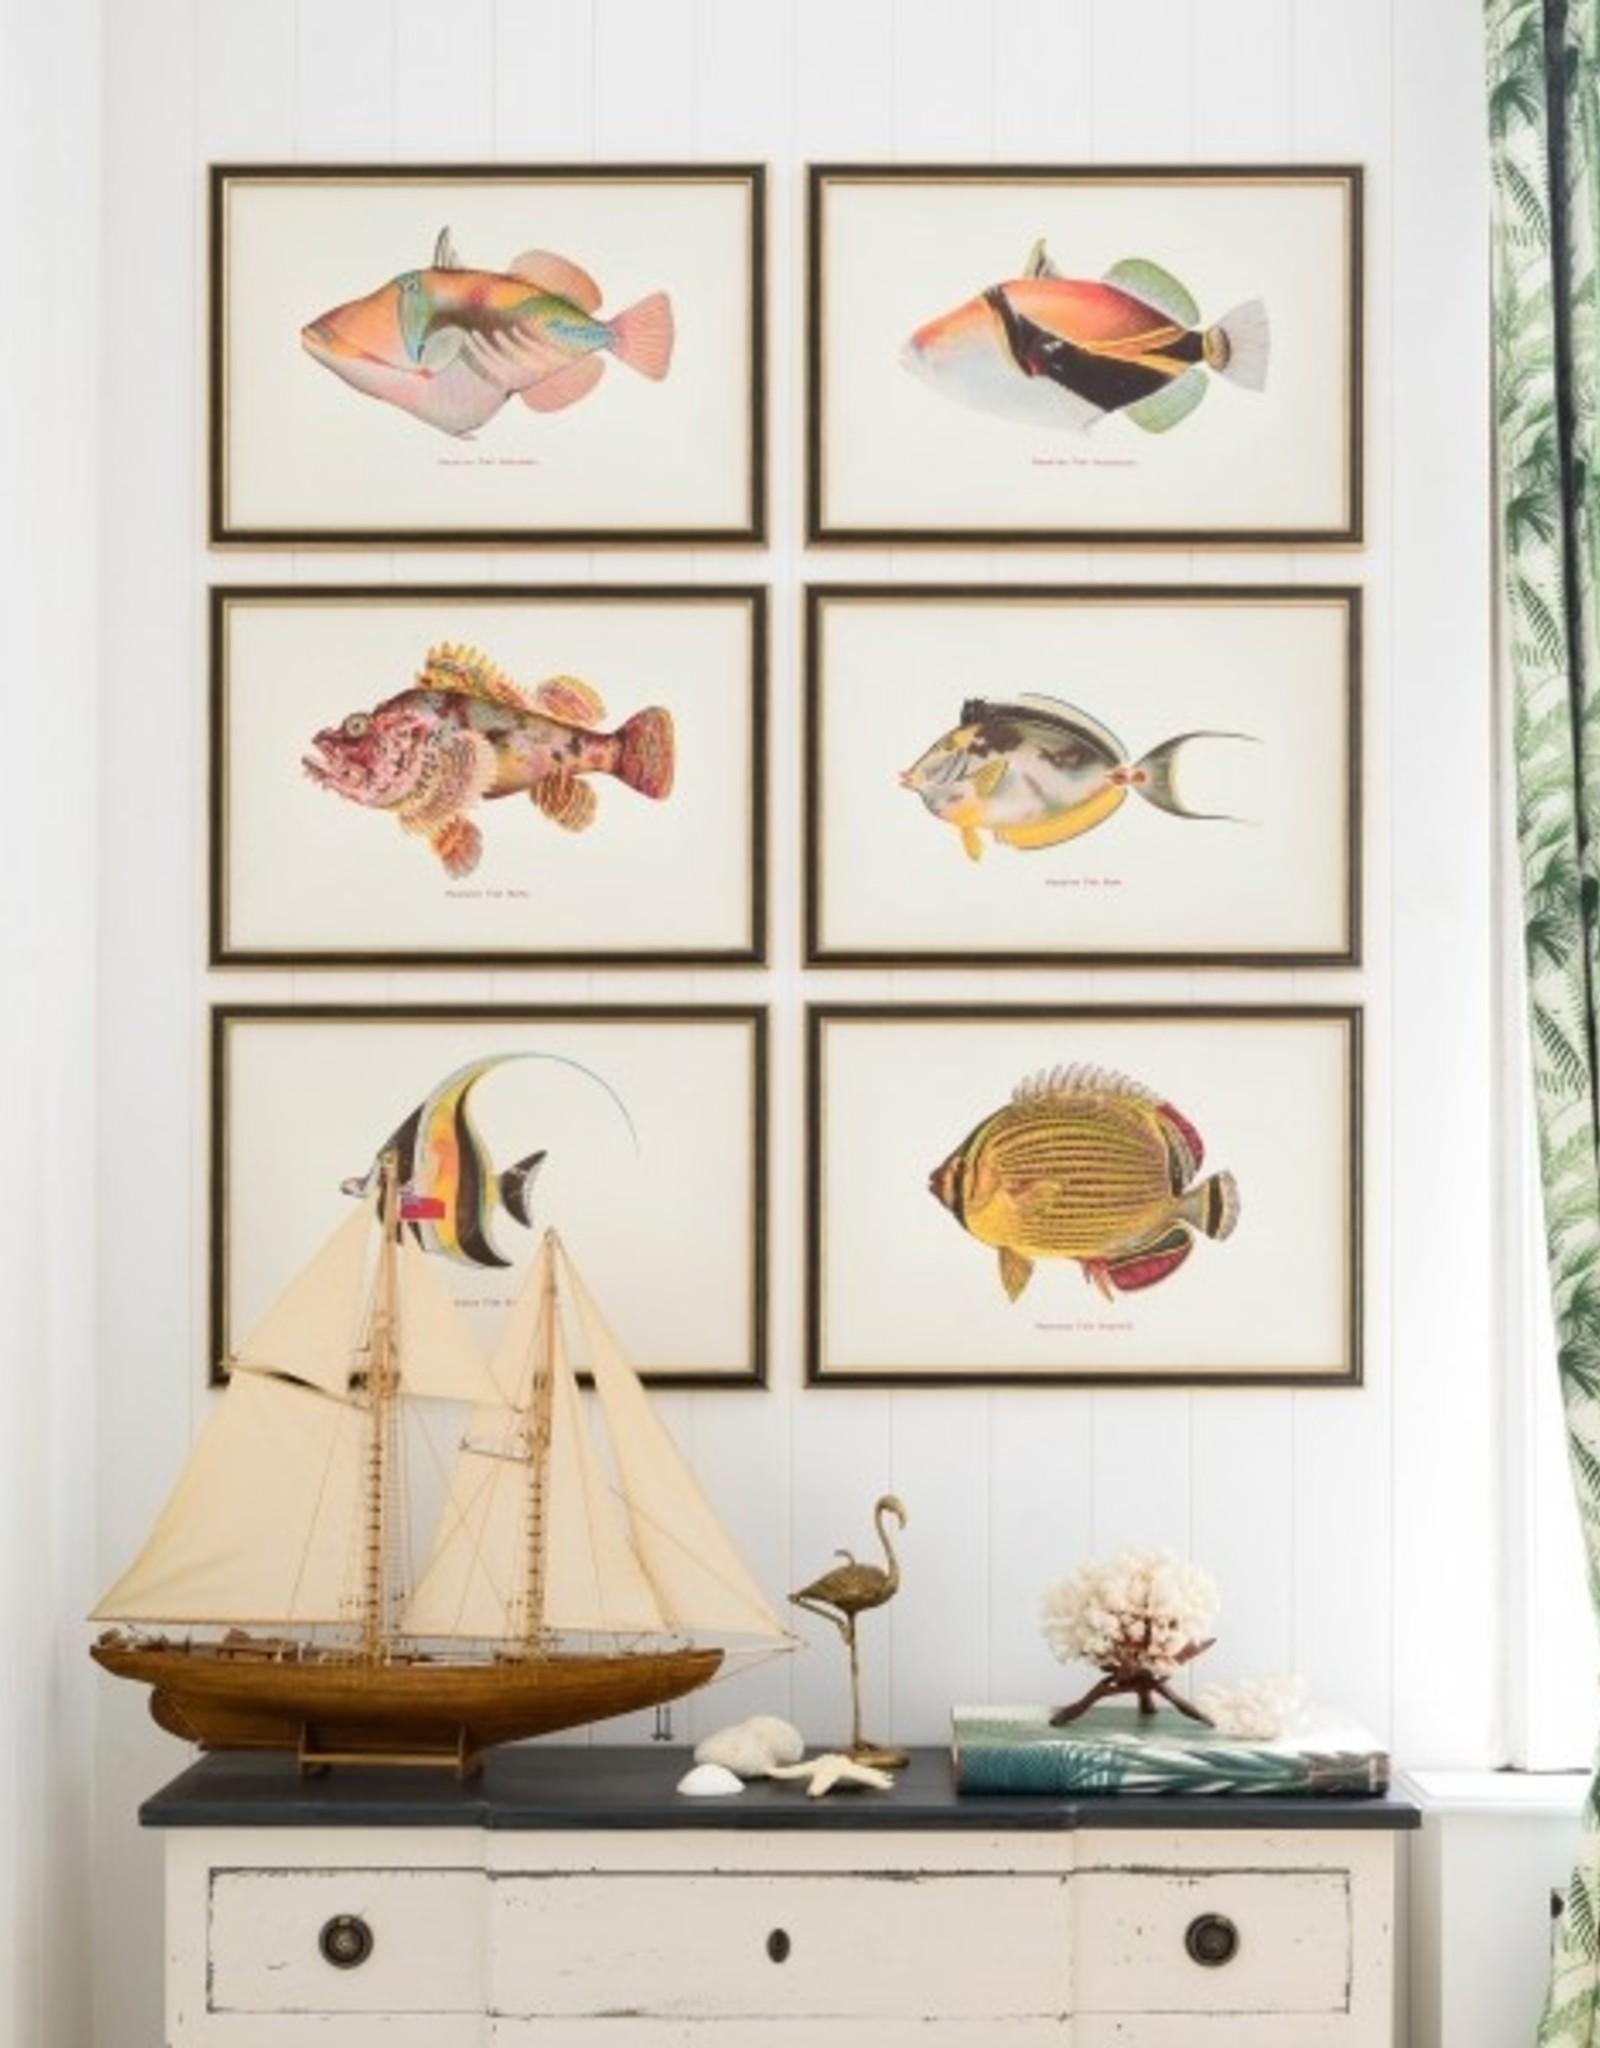 Mind the Gap Framed Art 60 x 40 cm - Fishes of hawaii - Humuhumu Fish